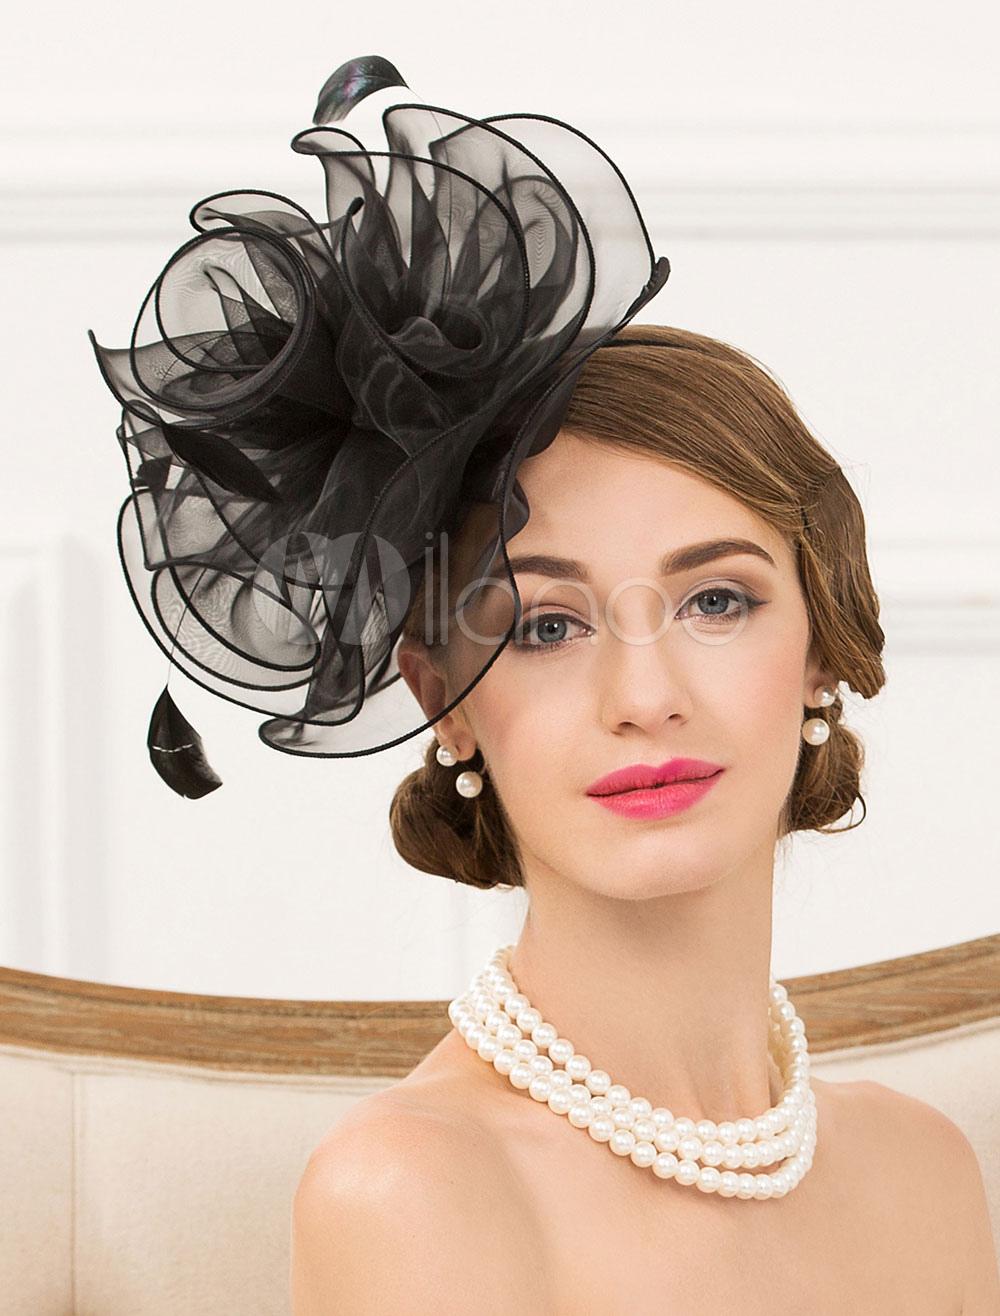 Buy Flapper Costume Hat Organza Flower Feather Black Retro Costume Headpiece Hat Halloween for $26.99 in Milanoo store